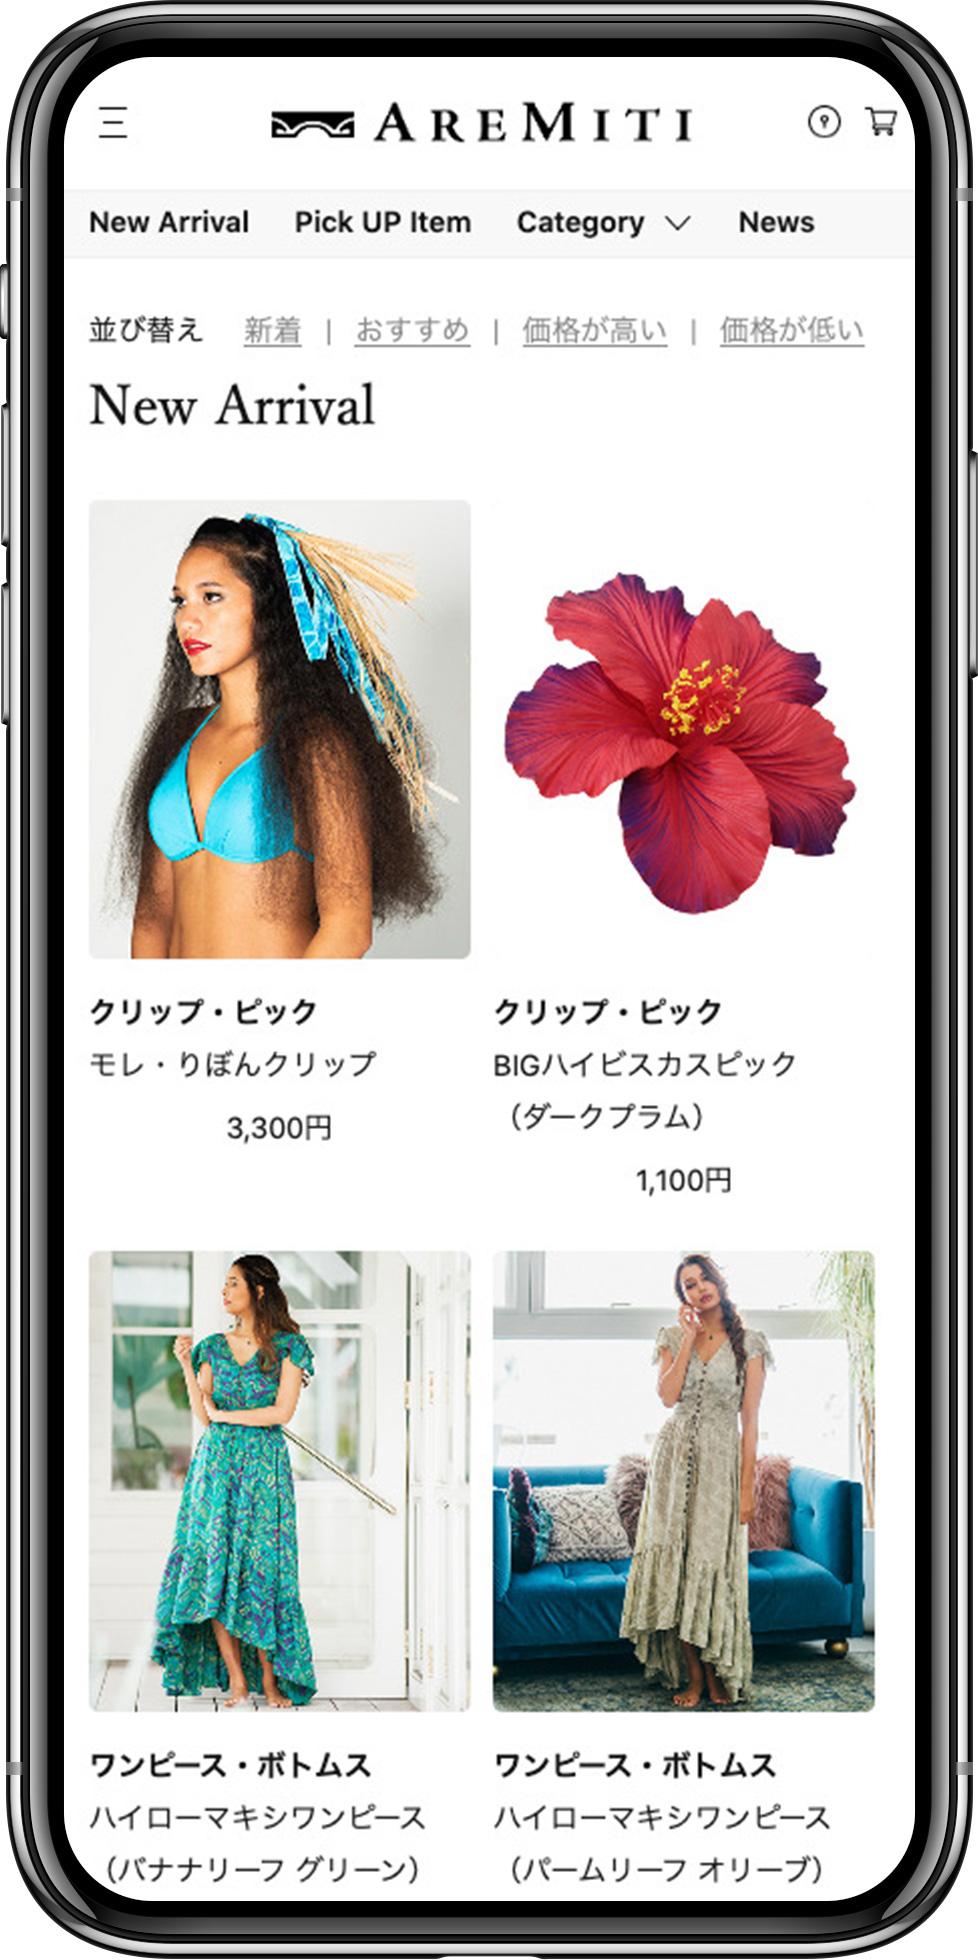 https://artpeace.jp/wp-content/uploads/2020/04/aremit_1.png